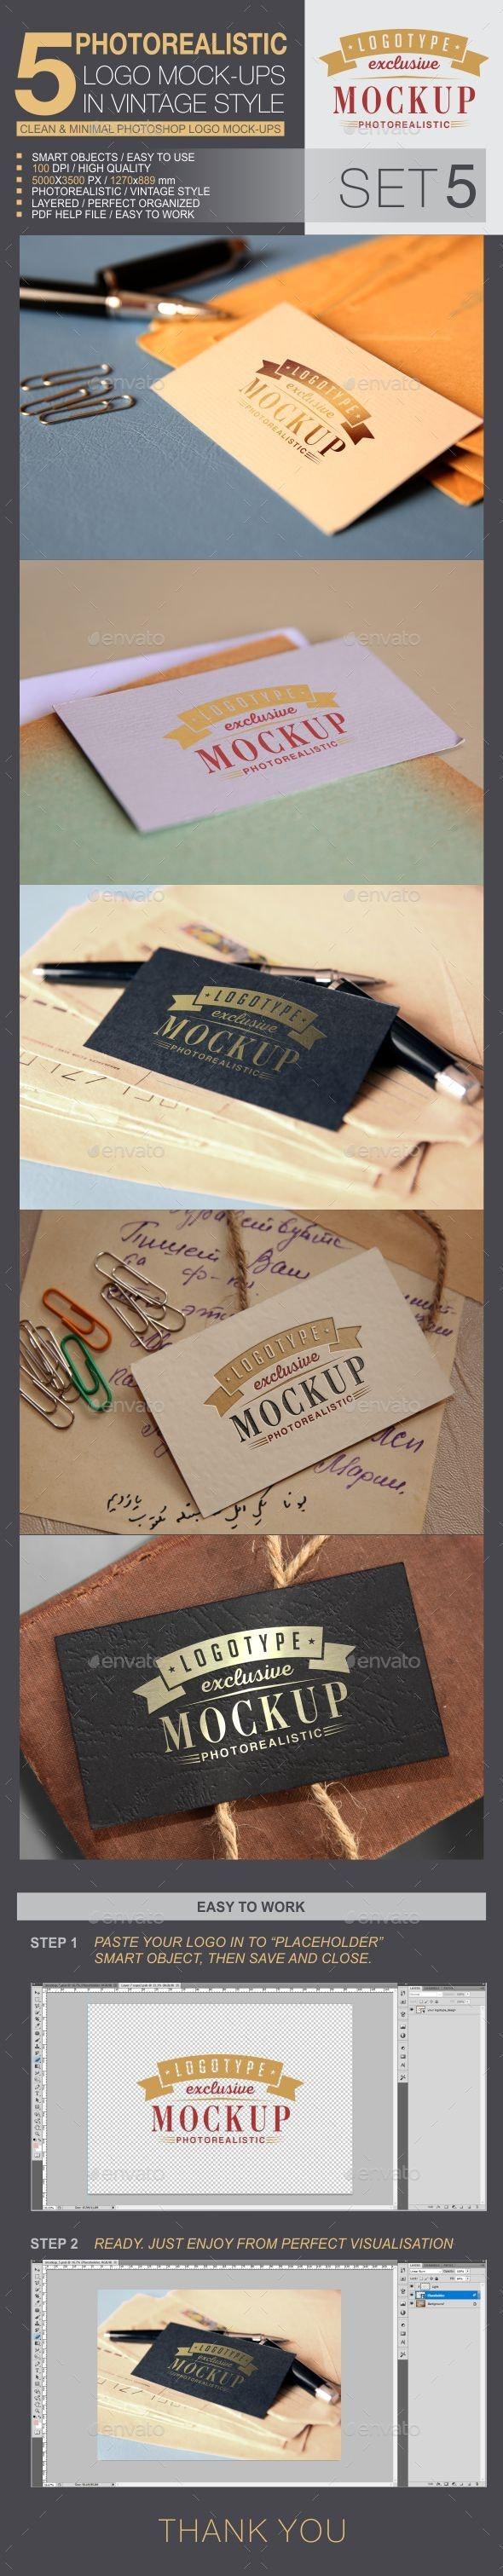 5 Logo Mock-Ups In Vintage Style - Set 5 - Logo Product Mock-Ups